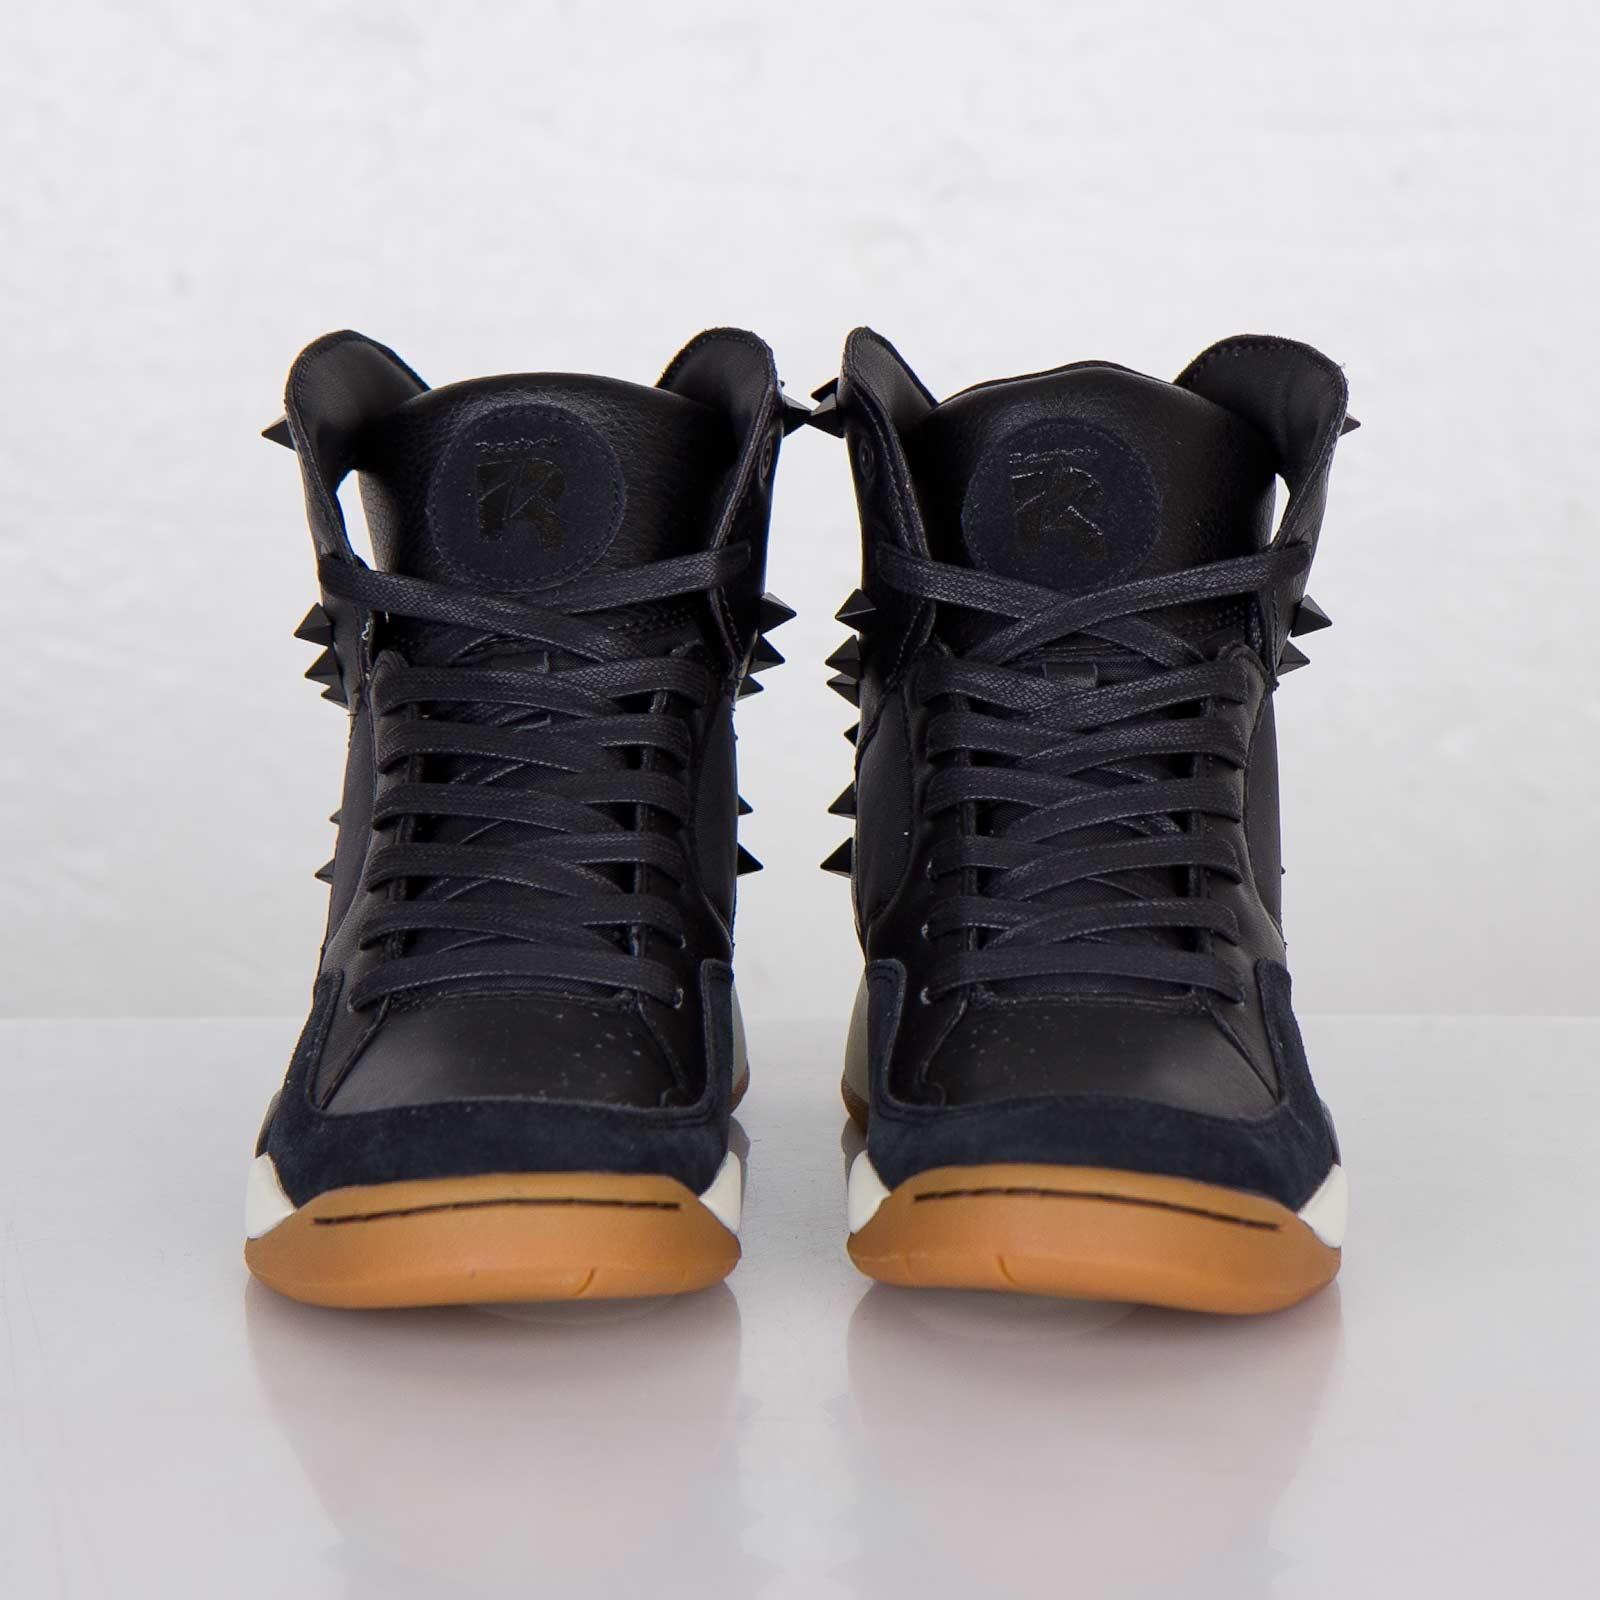 fa8e45f4a8d Reebok A.Keys Court - V60899 - Sneakersnstuff